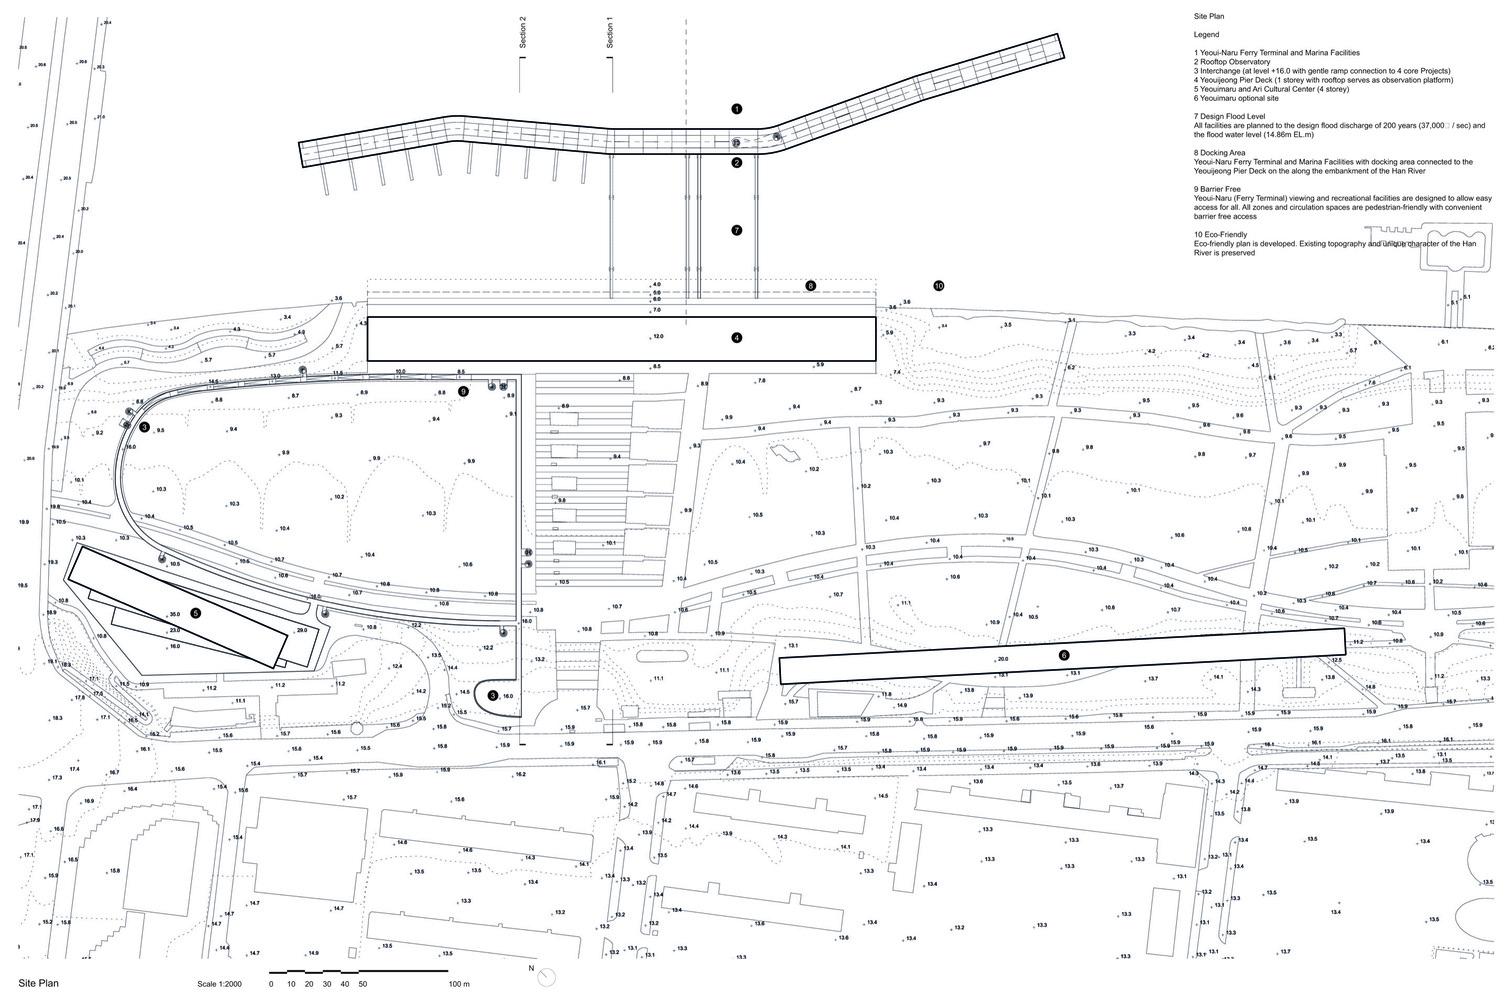 i m506 wiring diagram yorkromanfestival co uk Daihatsu Taft i m506 wiring diagram 15 17 jav bildung de u2022 rh 15 17 jav bildung de